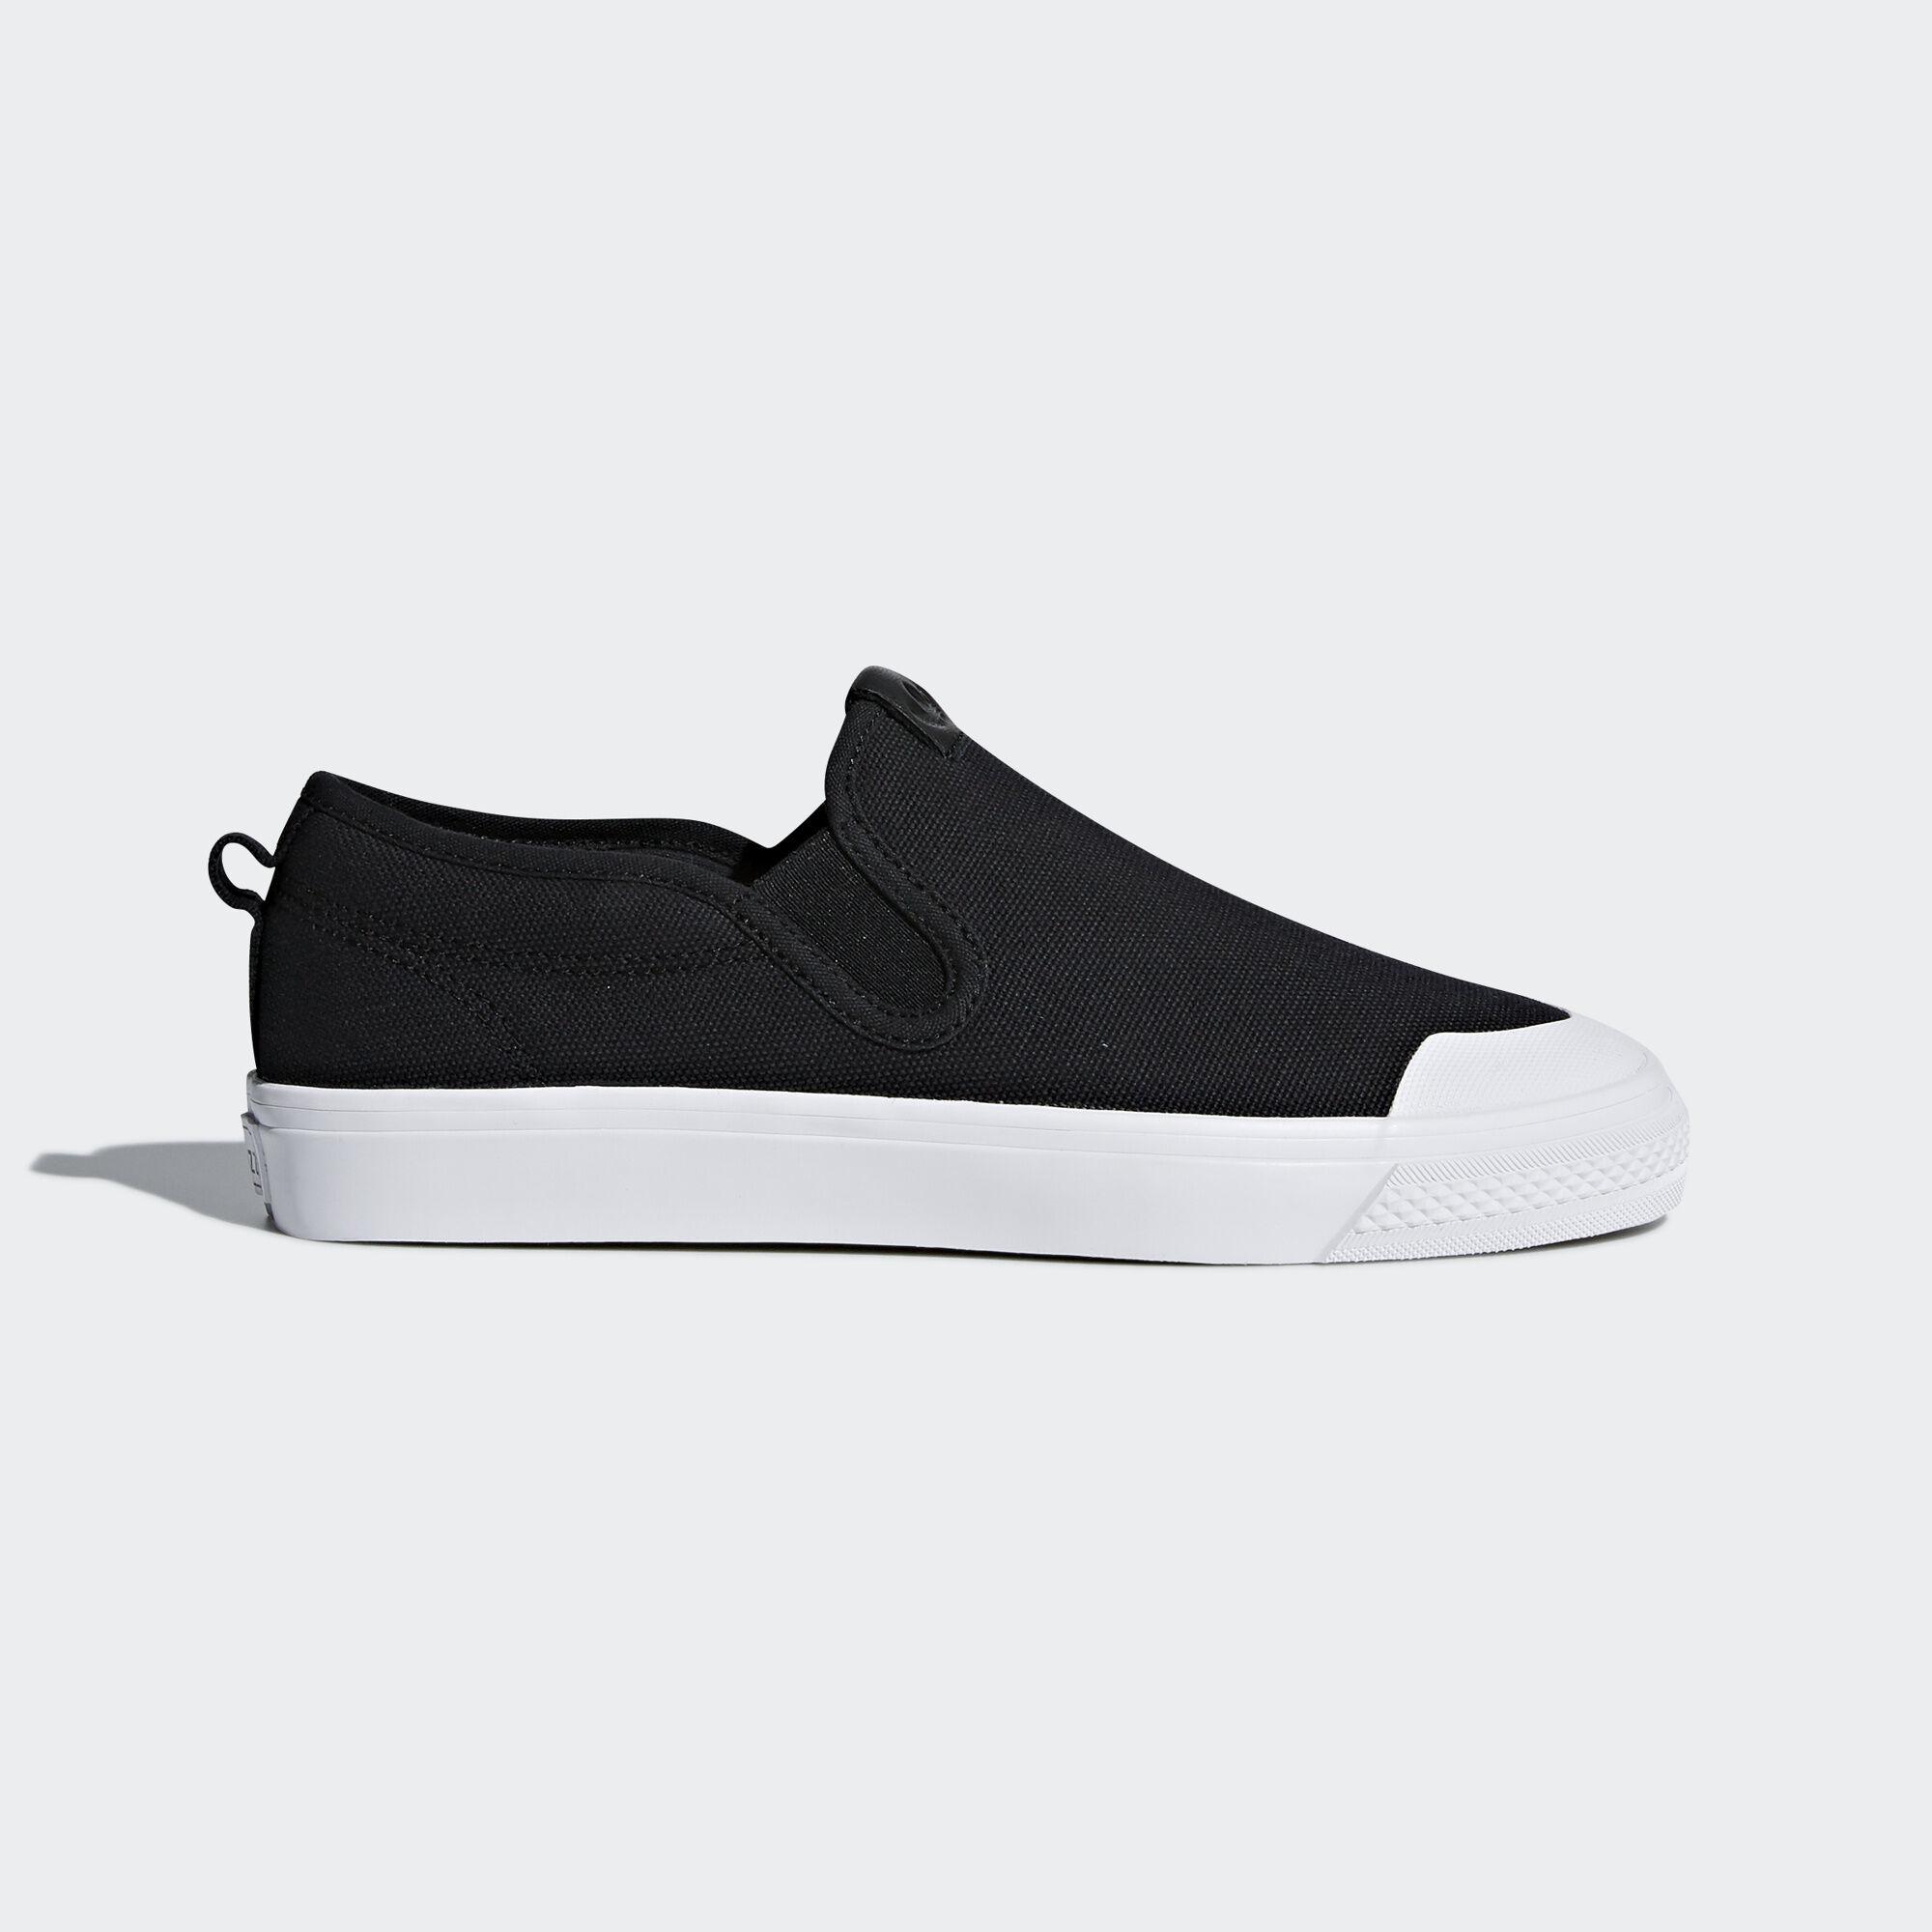 Adidas BB6242 Women Stella McCartney Pureboost TR shoes white black ... 7ea4c2ed2